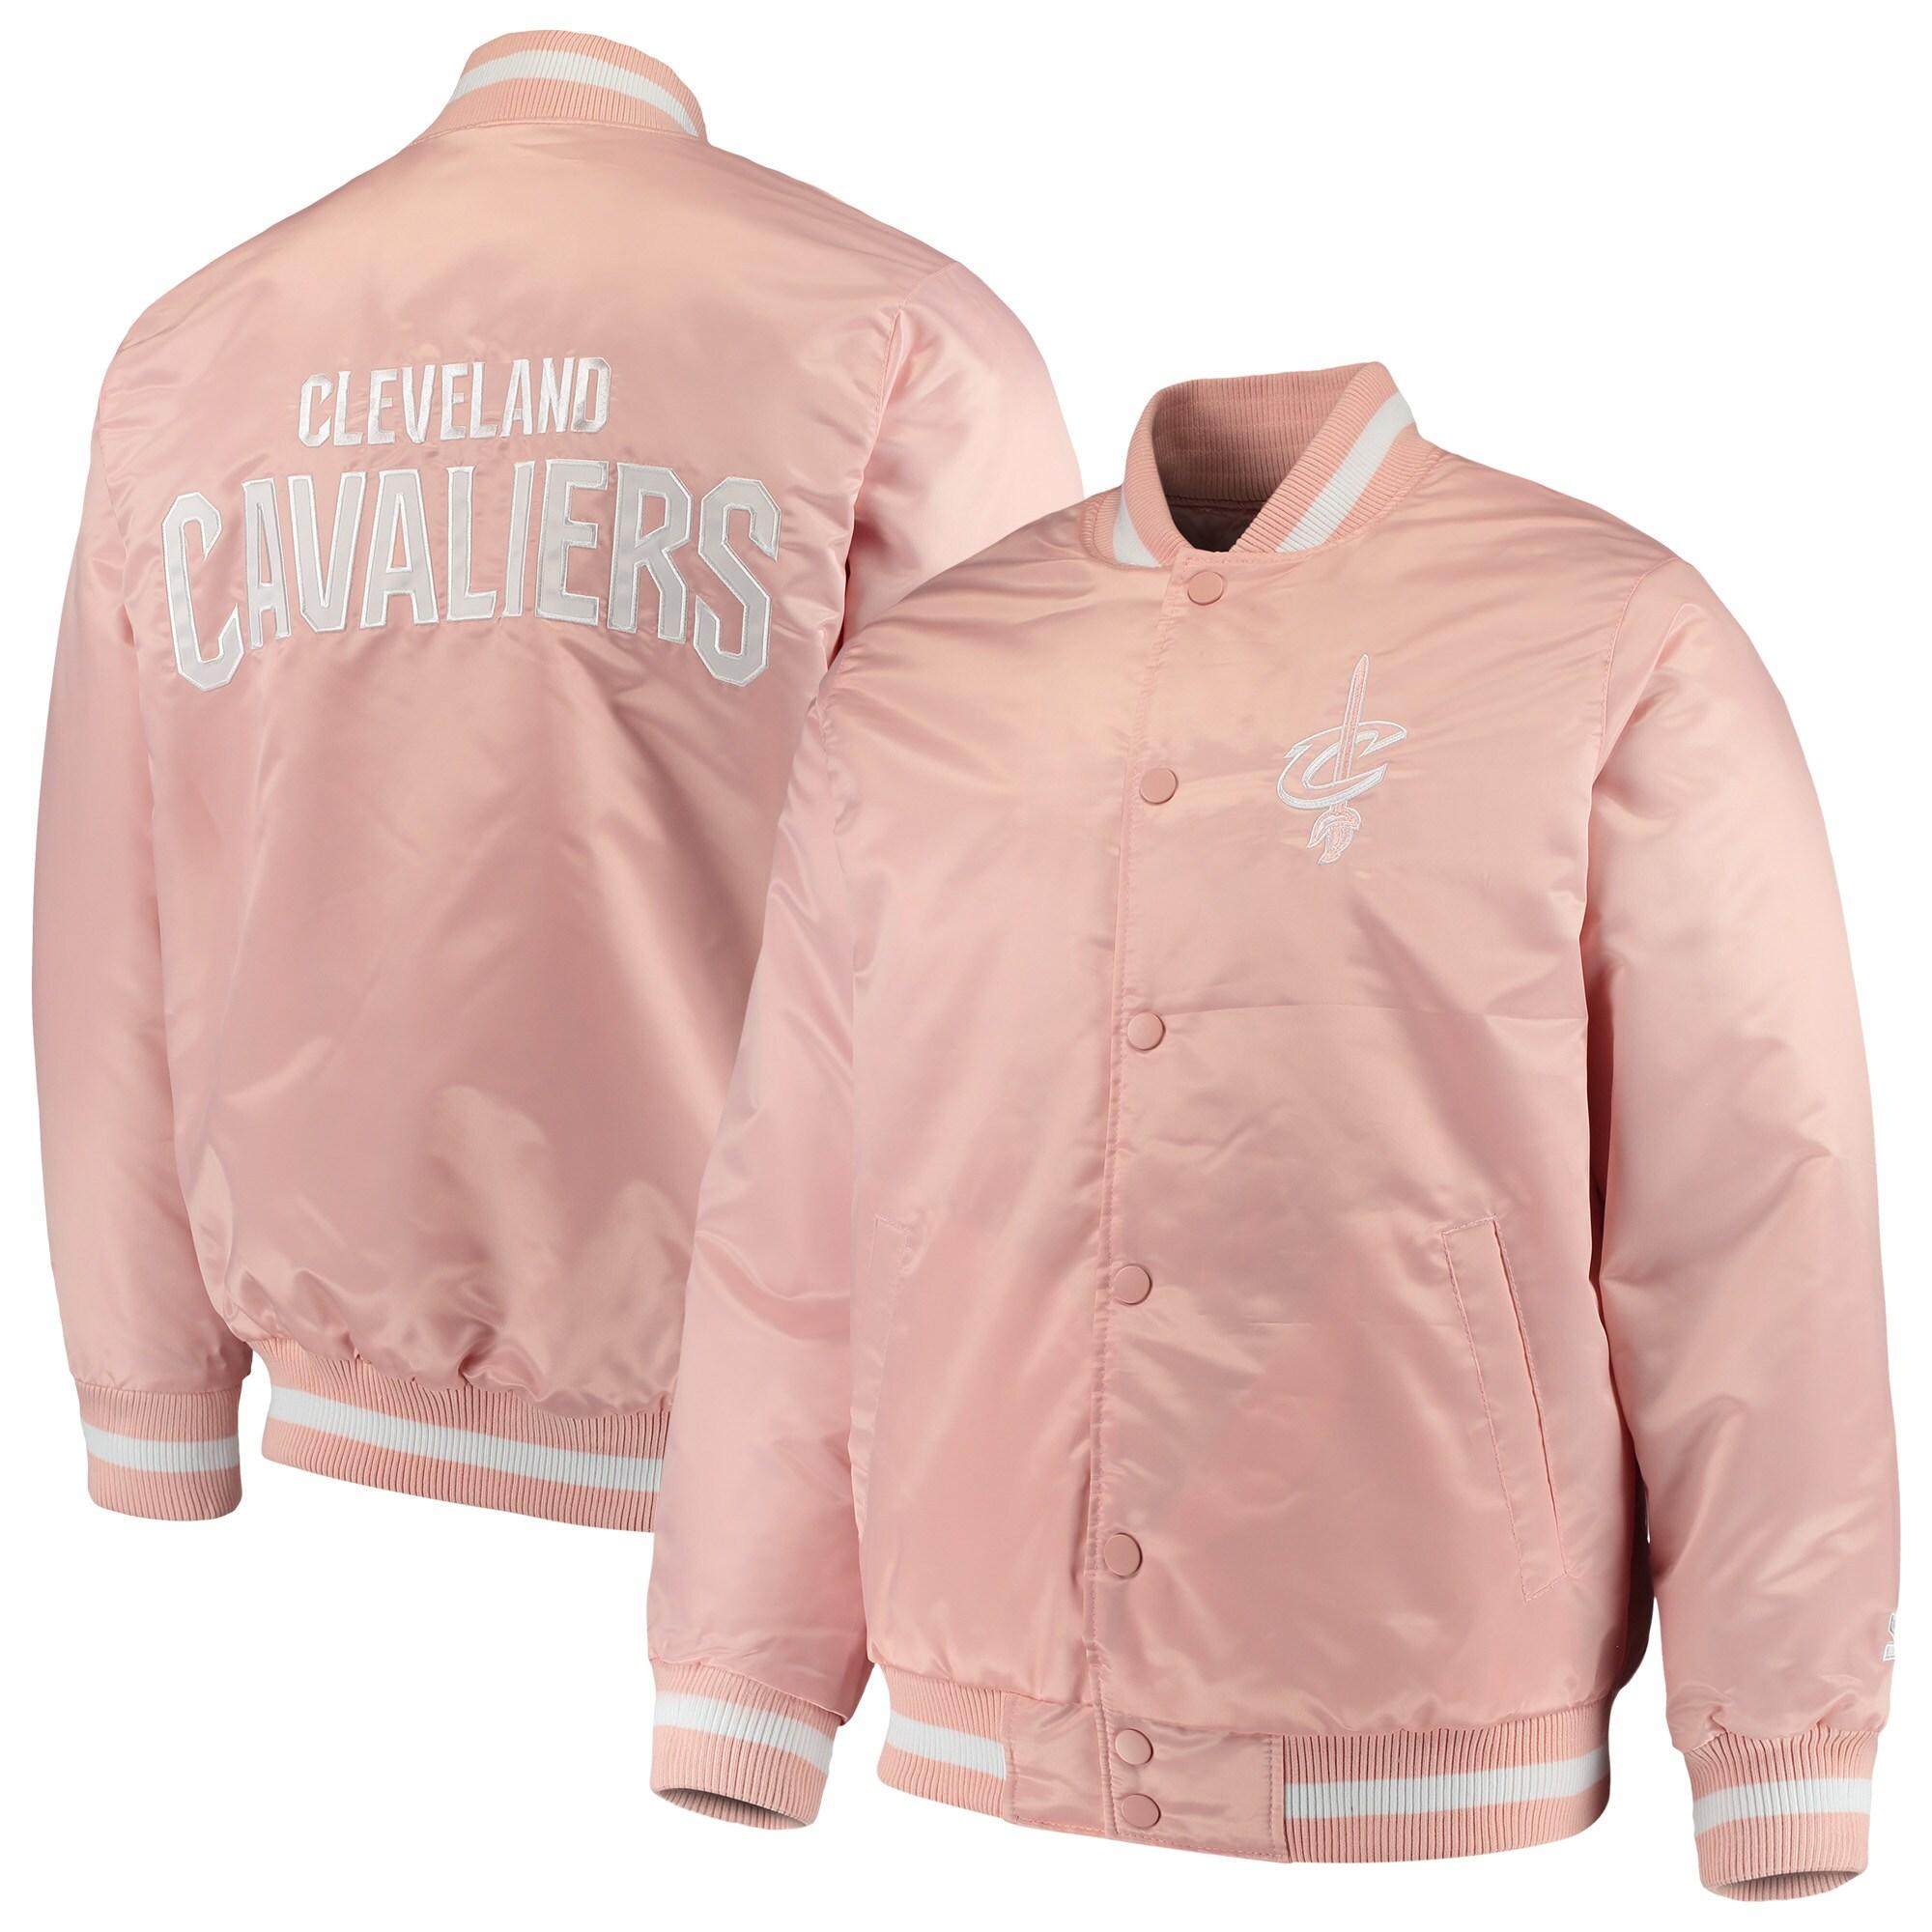 Cleveland Cavaliers Starter Satin Full-Snap Jacket - Pink